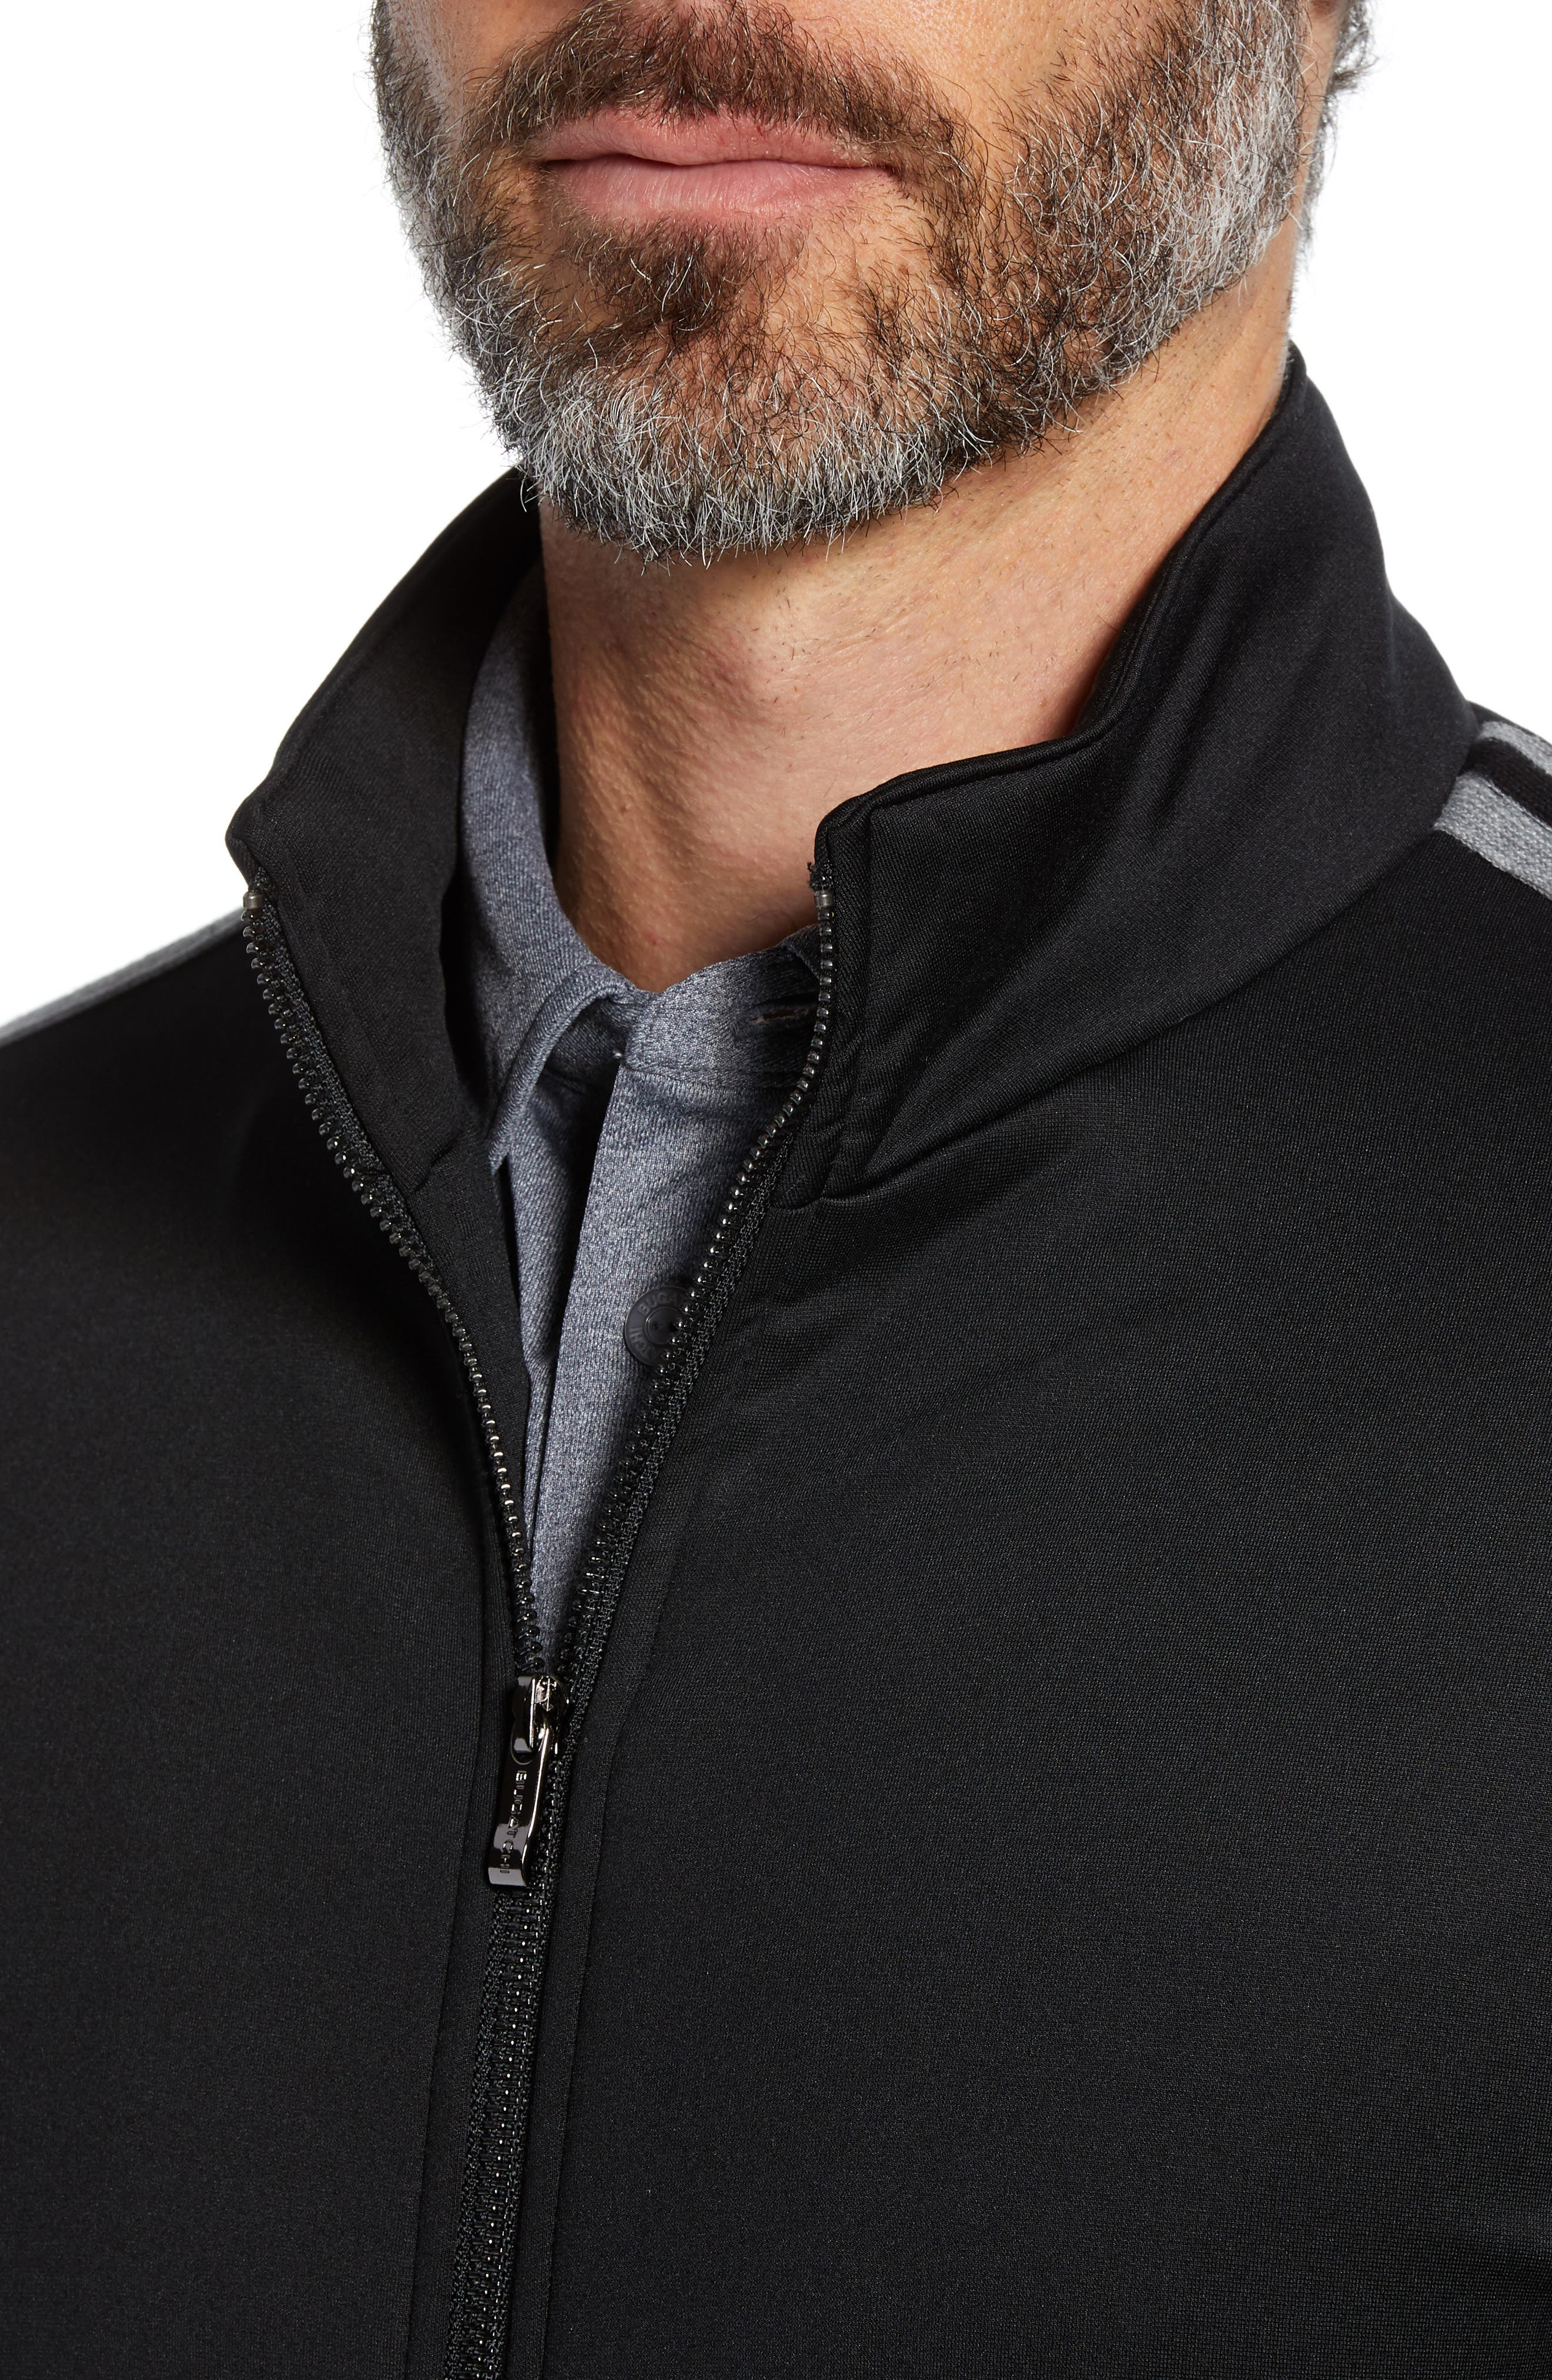 Knit Zip Jacket,                             Alternate thumbnail 4, color,                             BLACK